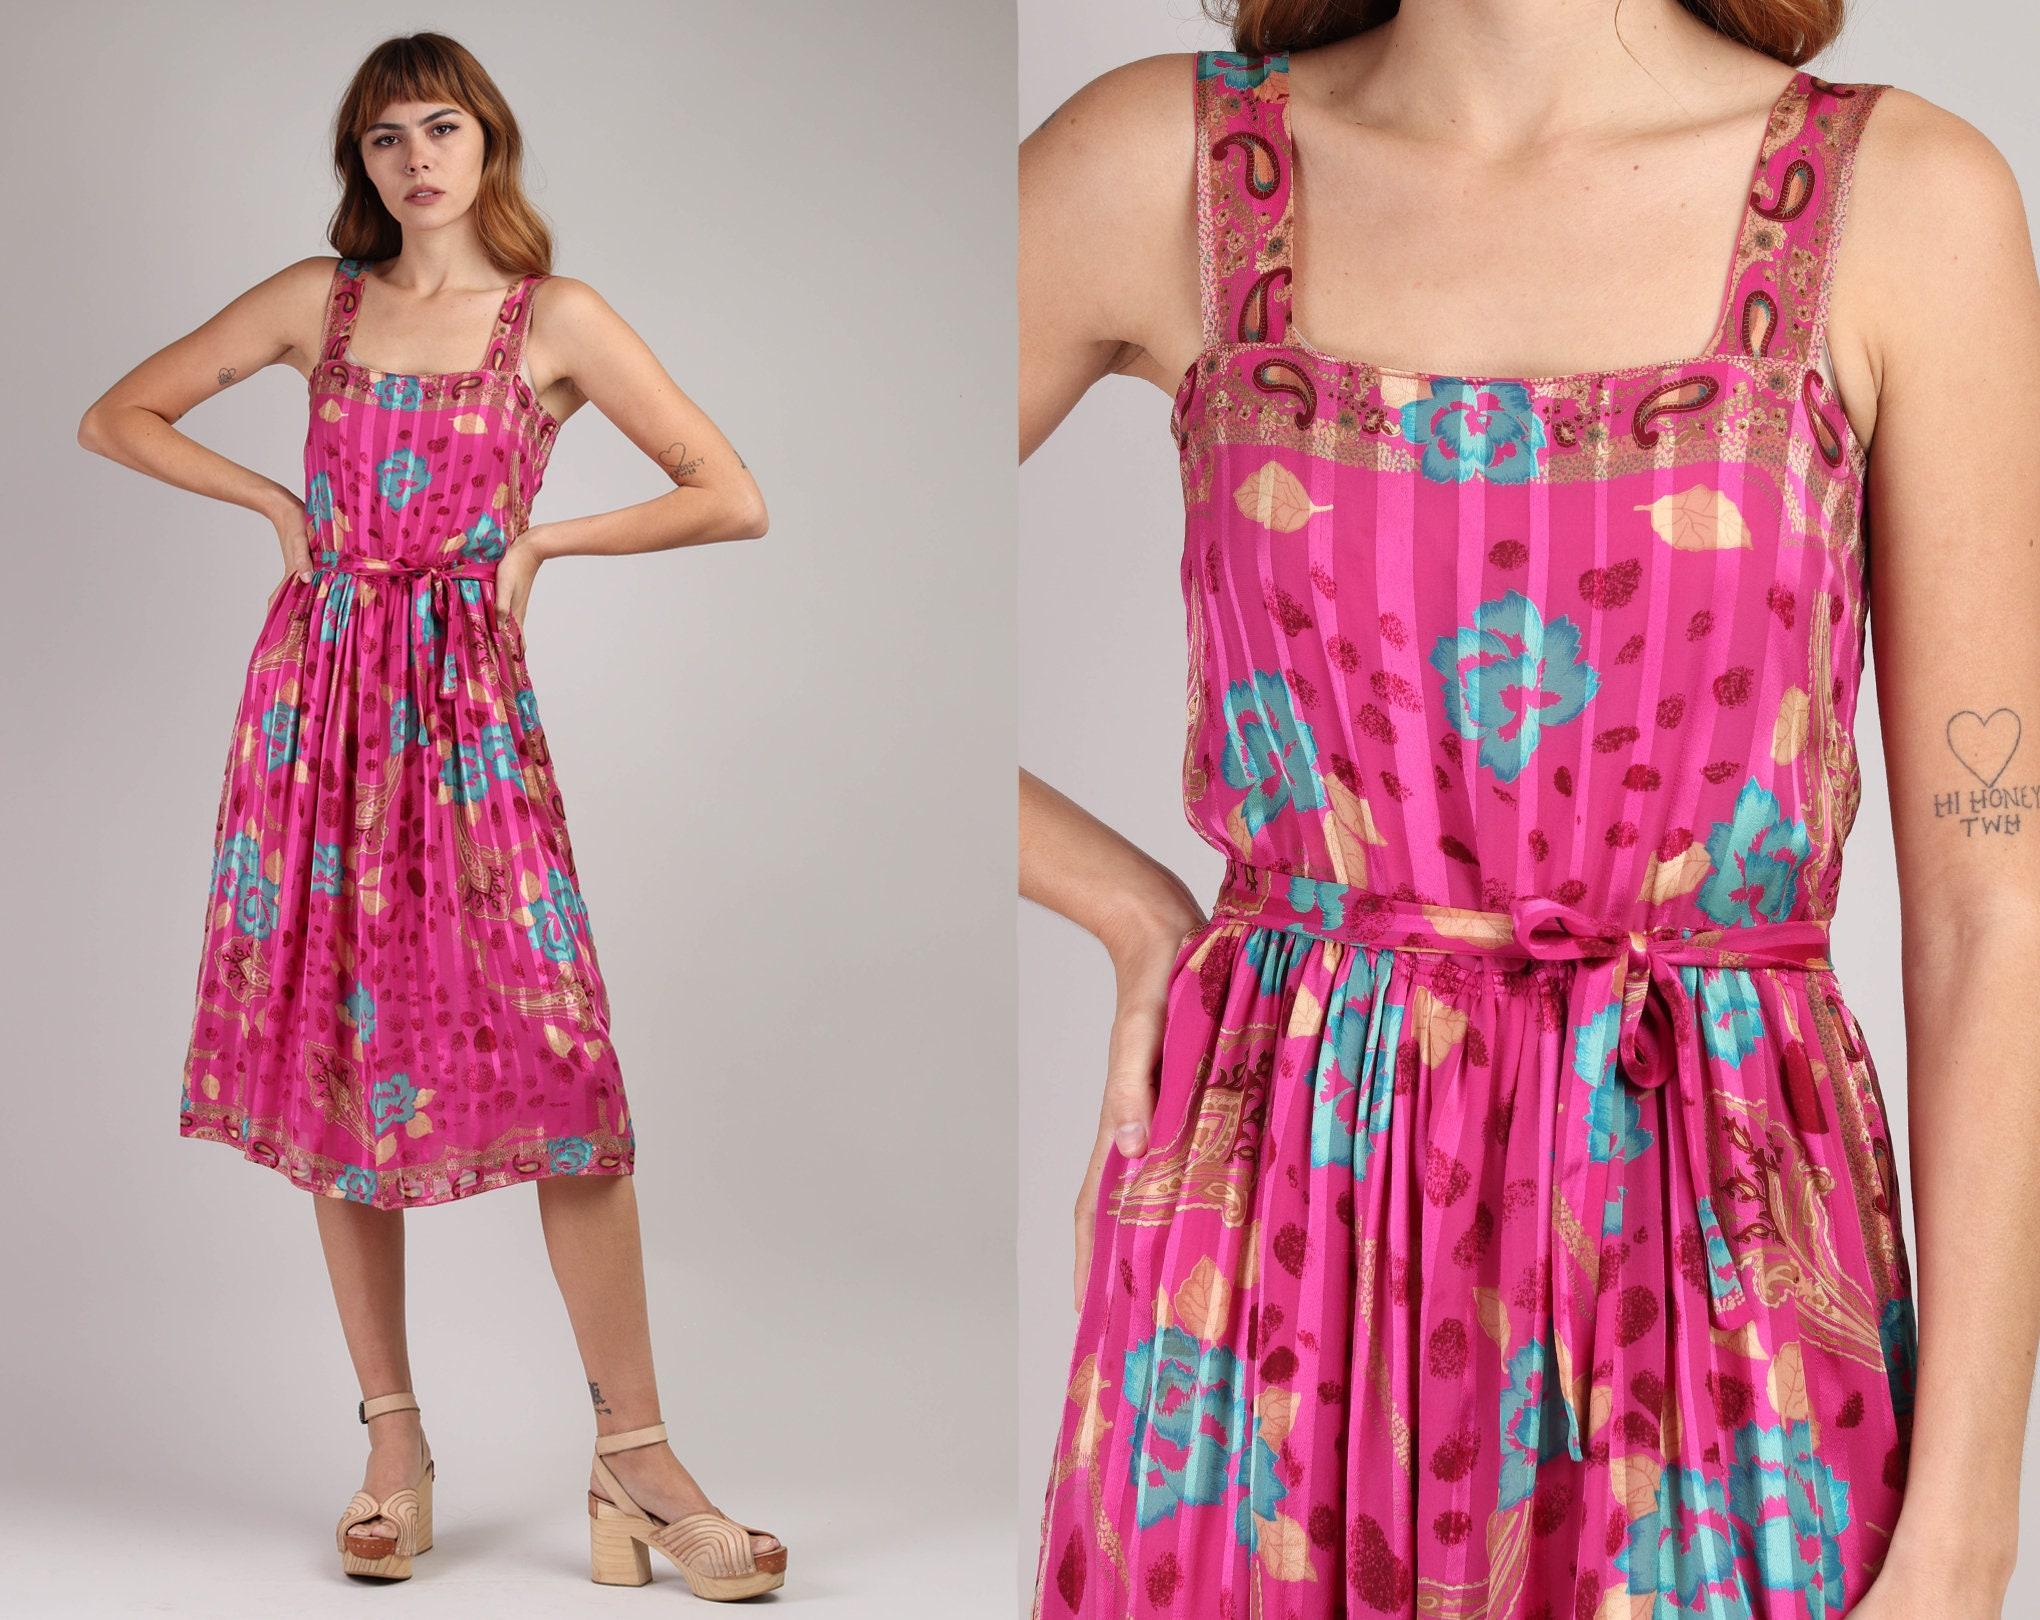 80s Dresses | Casual to Party Dresses 80S Botanical Silk Dress S MJacquard Silk Floral Border Print Tank Magenta Pink Midi Matching Small Medium 1980S $25.99 AT vintagedancer.com